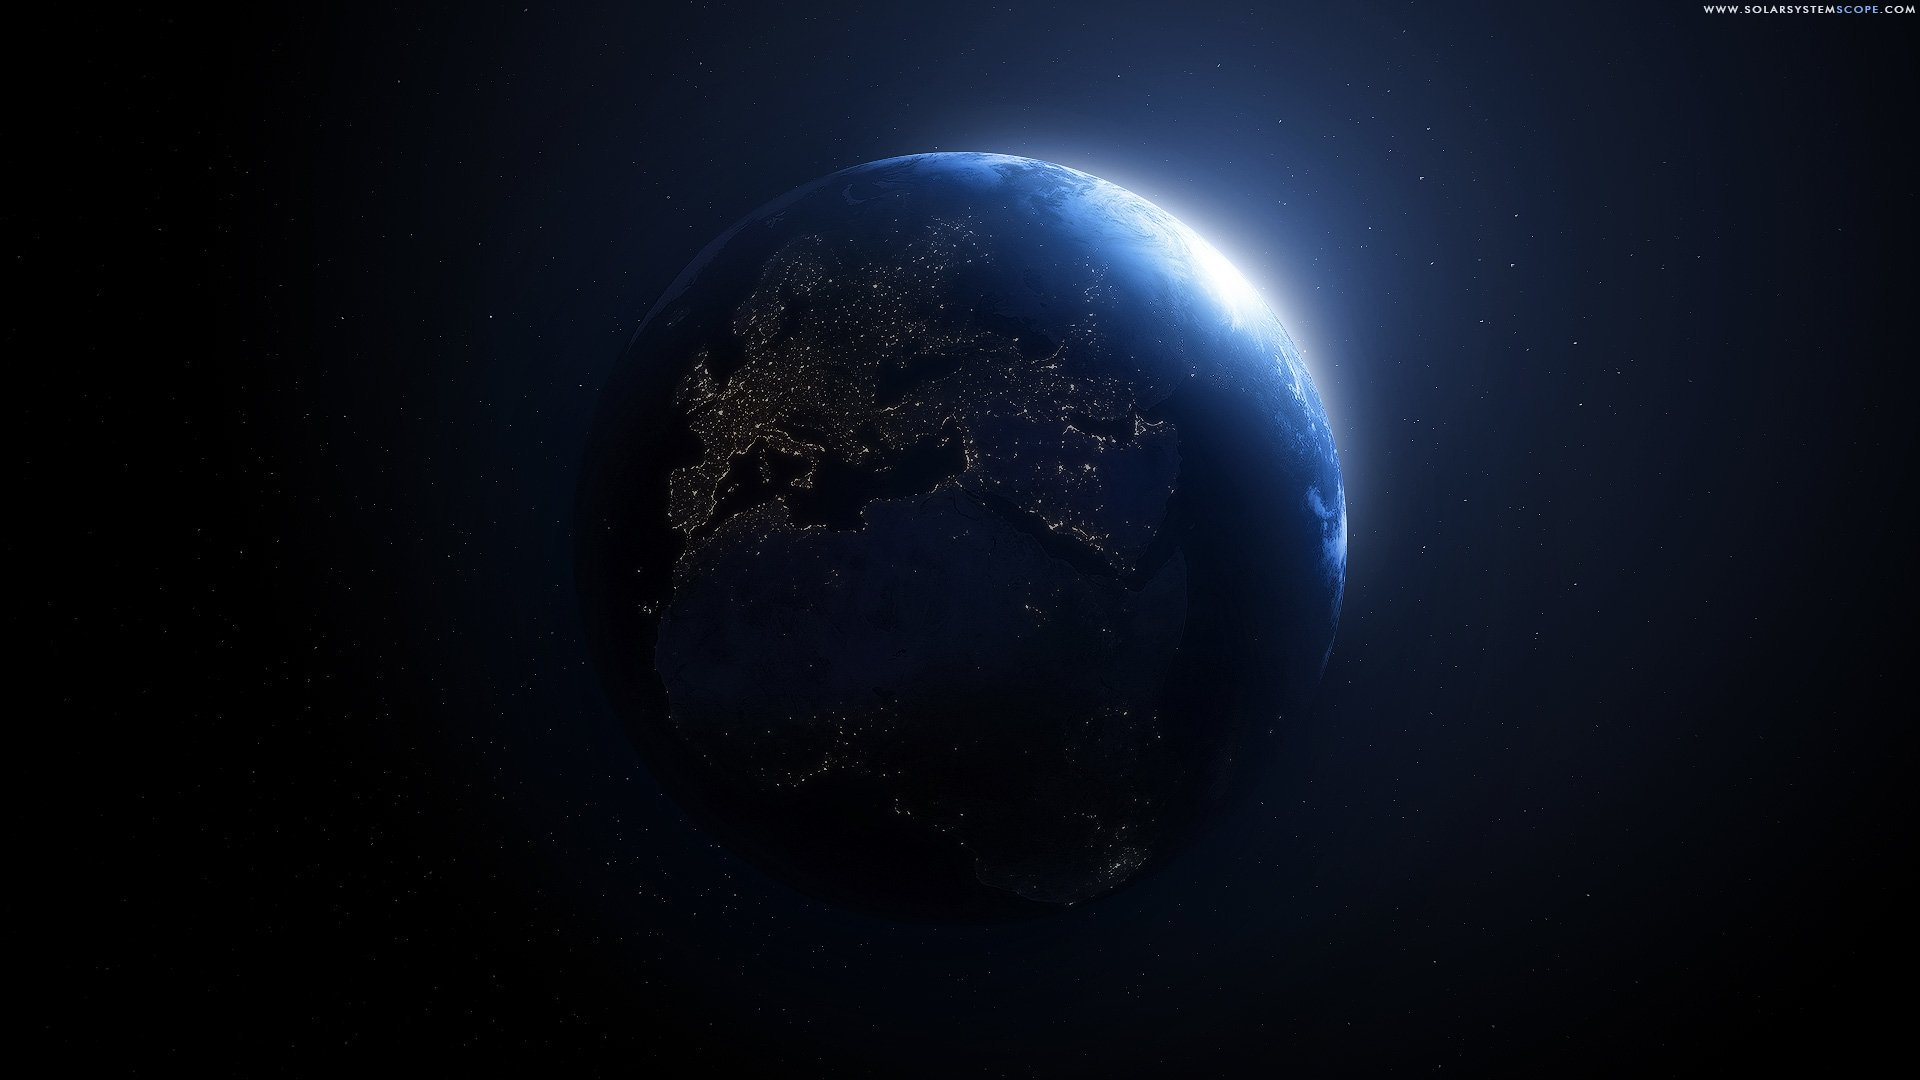 Blue Planet Hd Wallpaper Hintergrund 1920x1080 Id